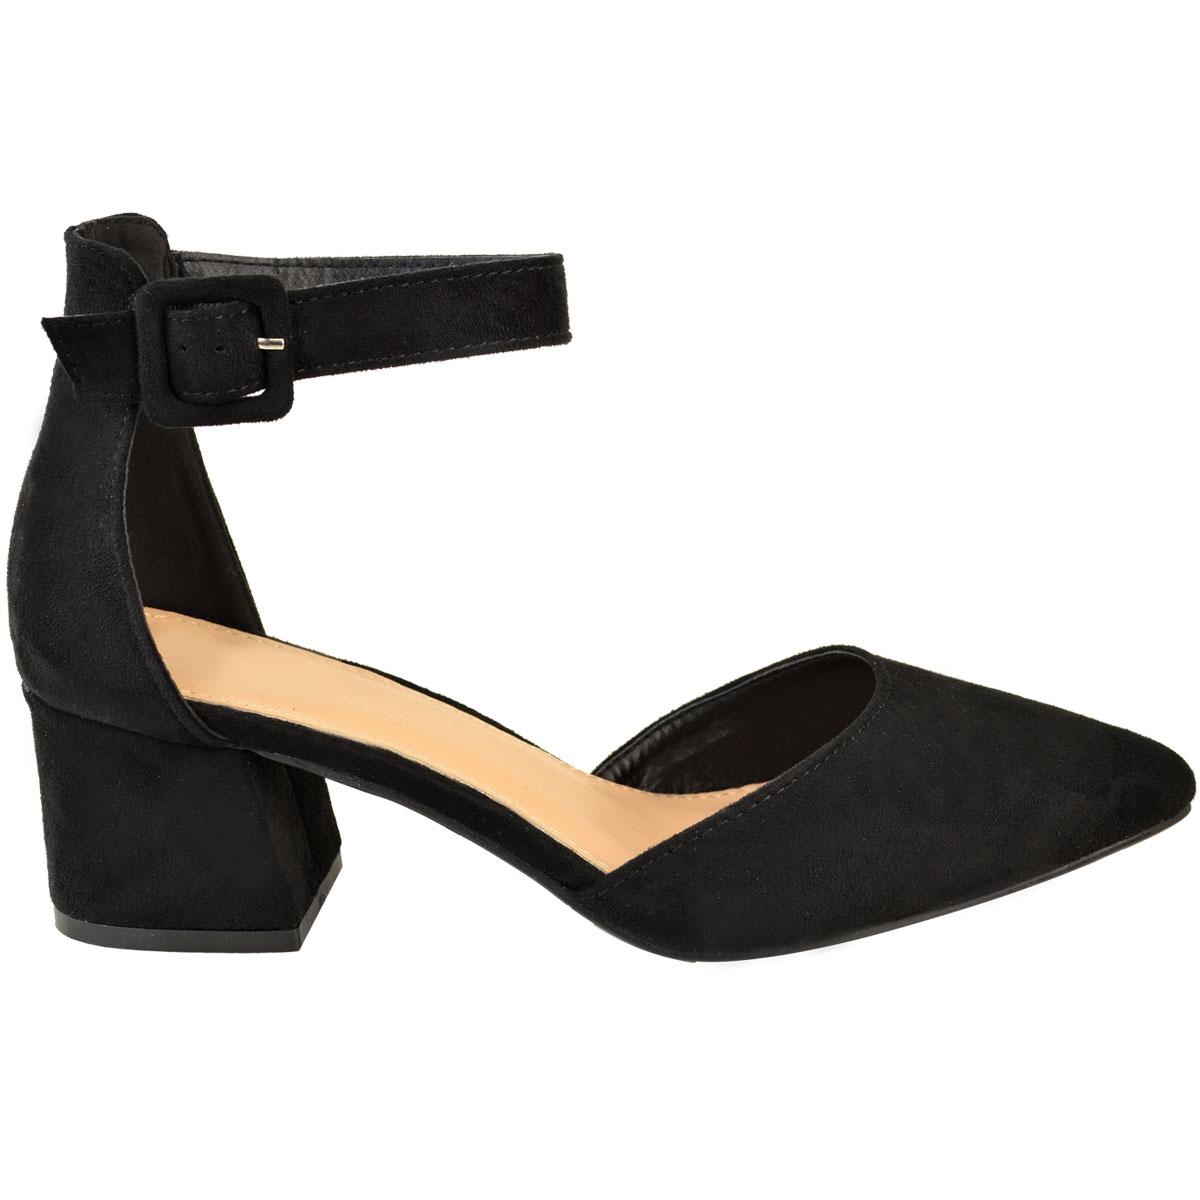 Womens Fashion Shoes Wholesale Uk